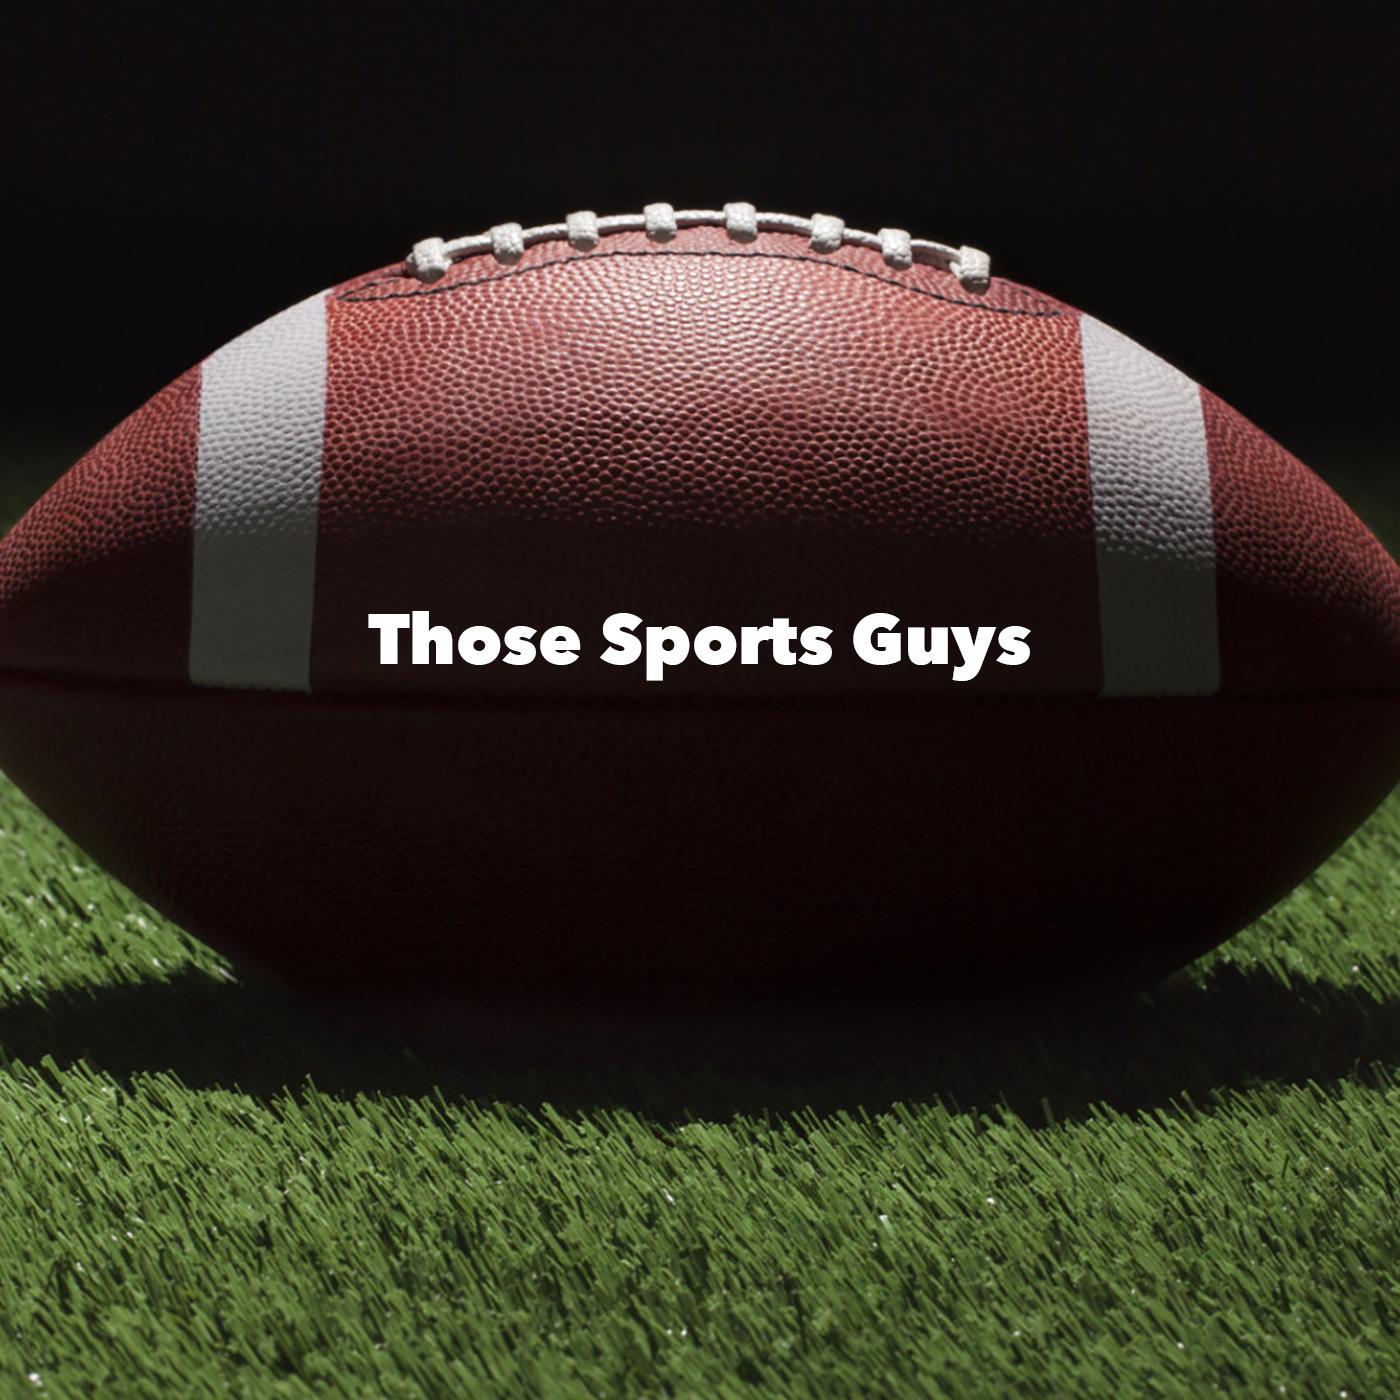 Those Sports Guys